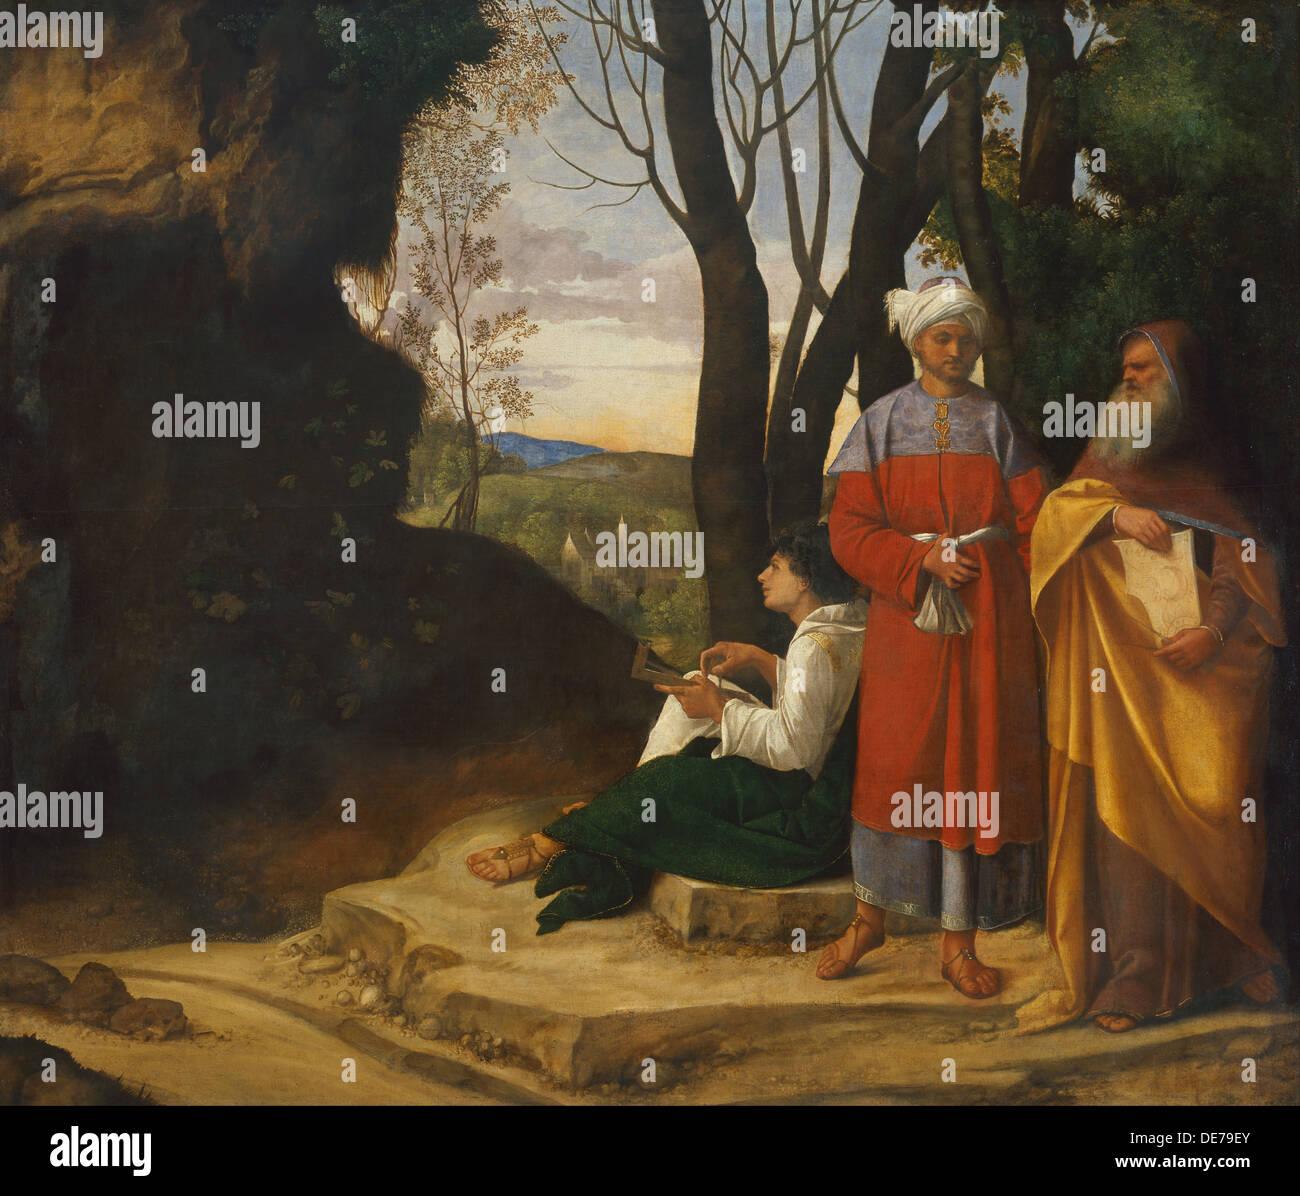 Artist: Giorgione (1476-1510) -